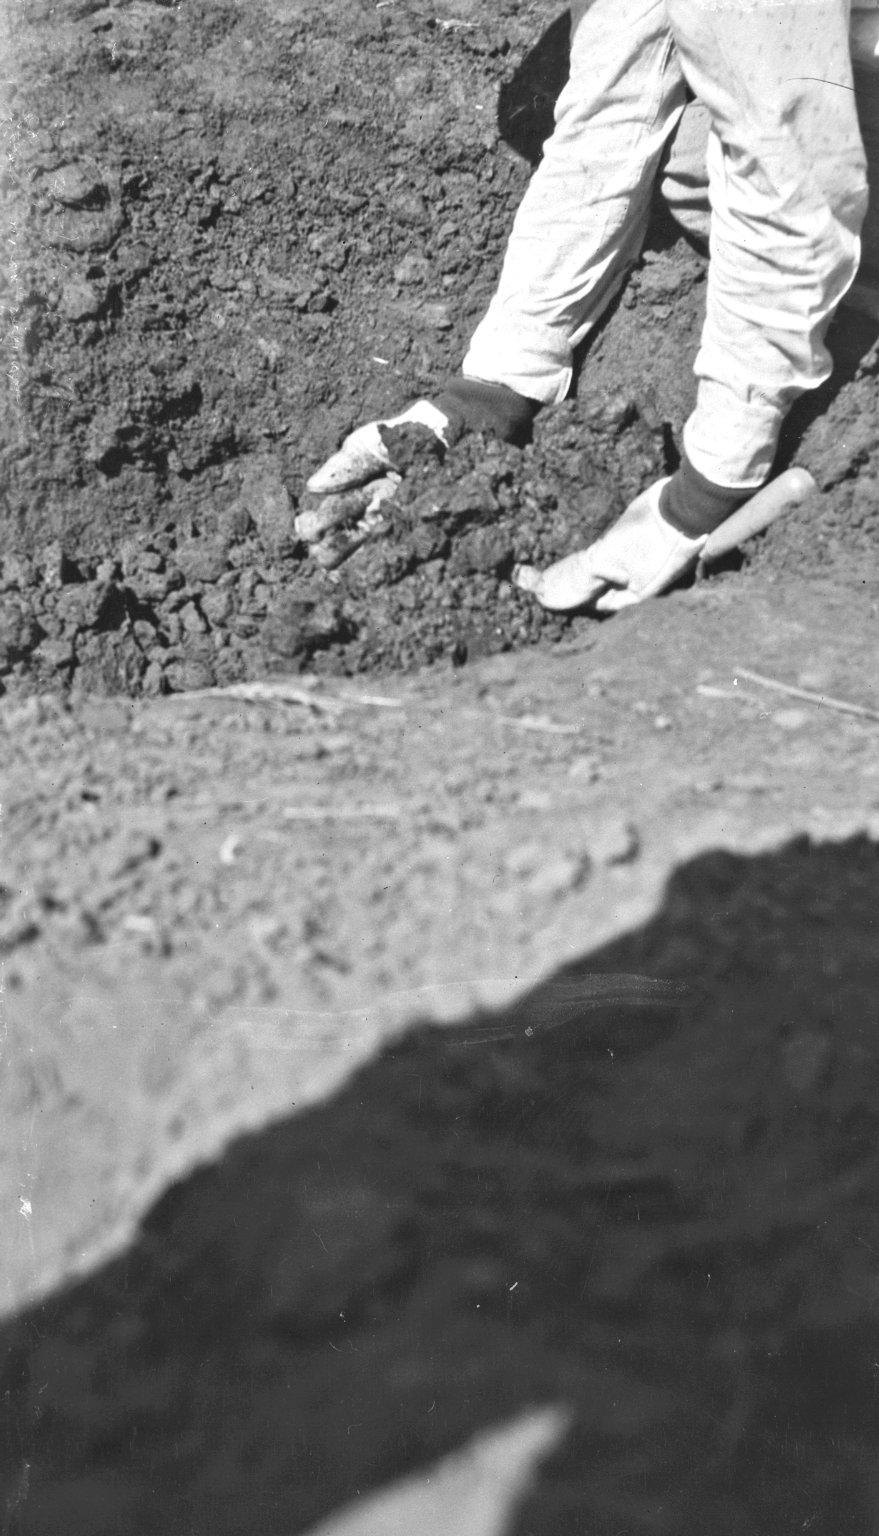 Excavation, closeup